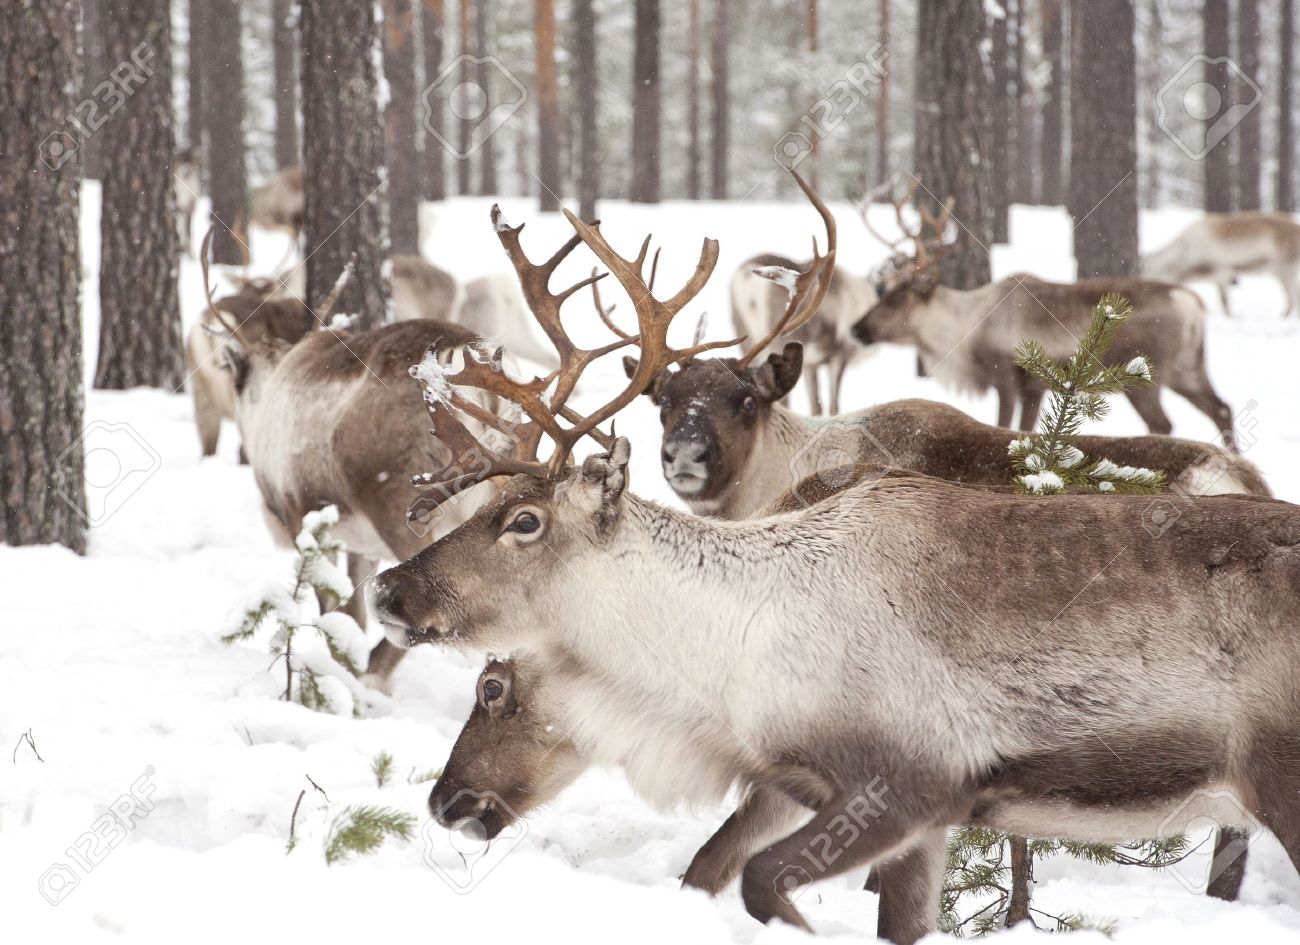 reindeer in its natural winter habitat in the north of Sweden Stock Photo - 12970103